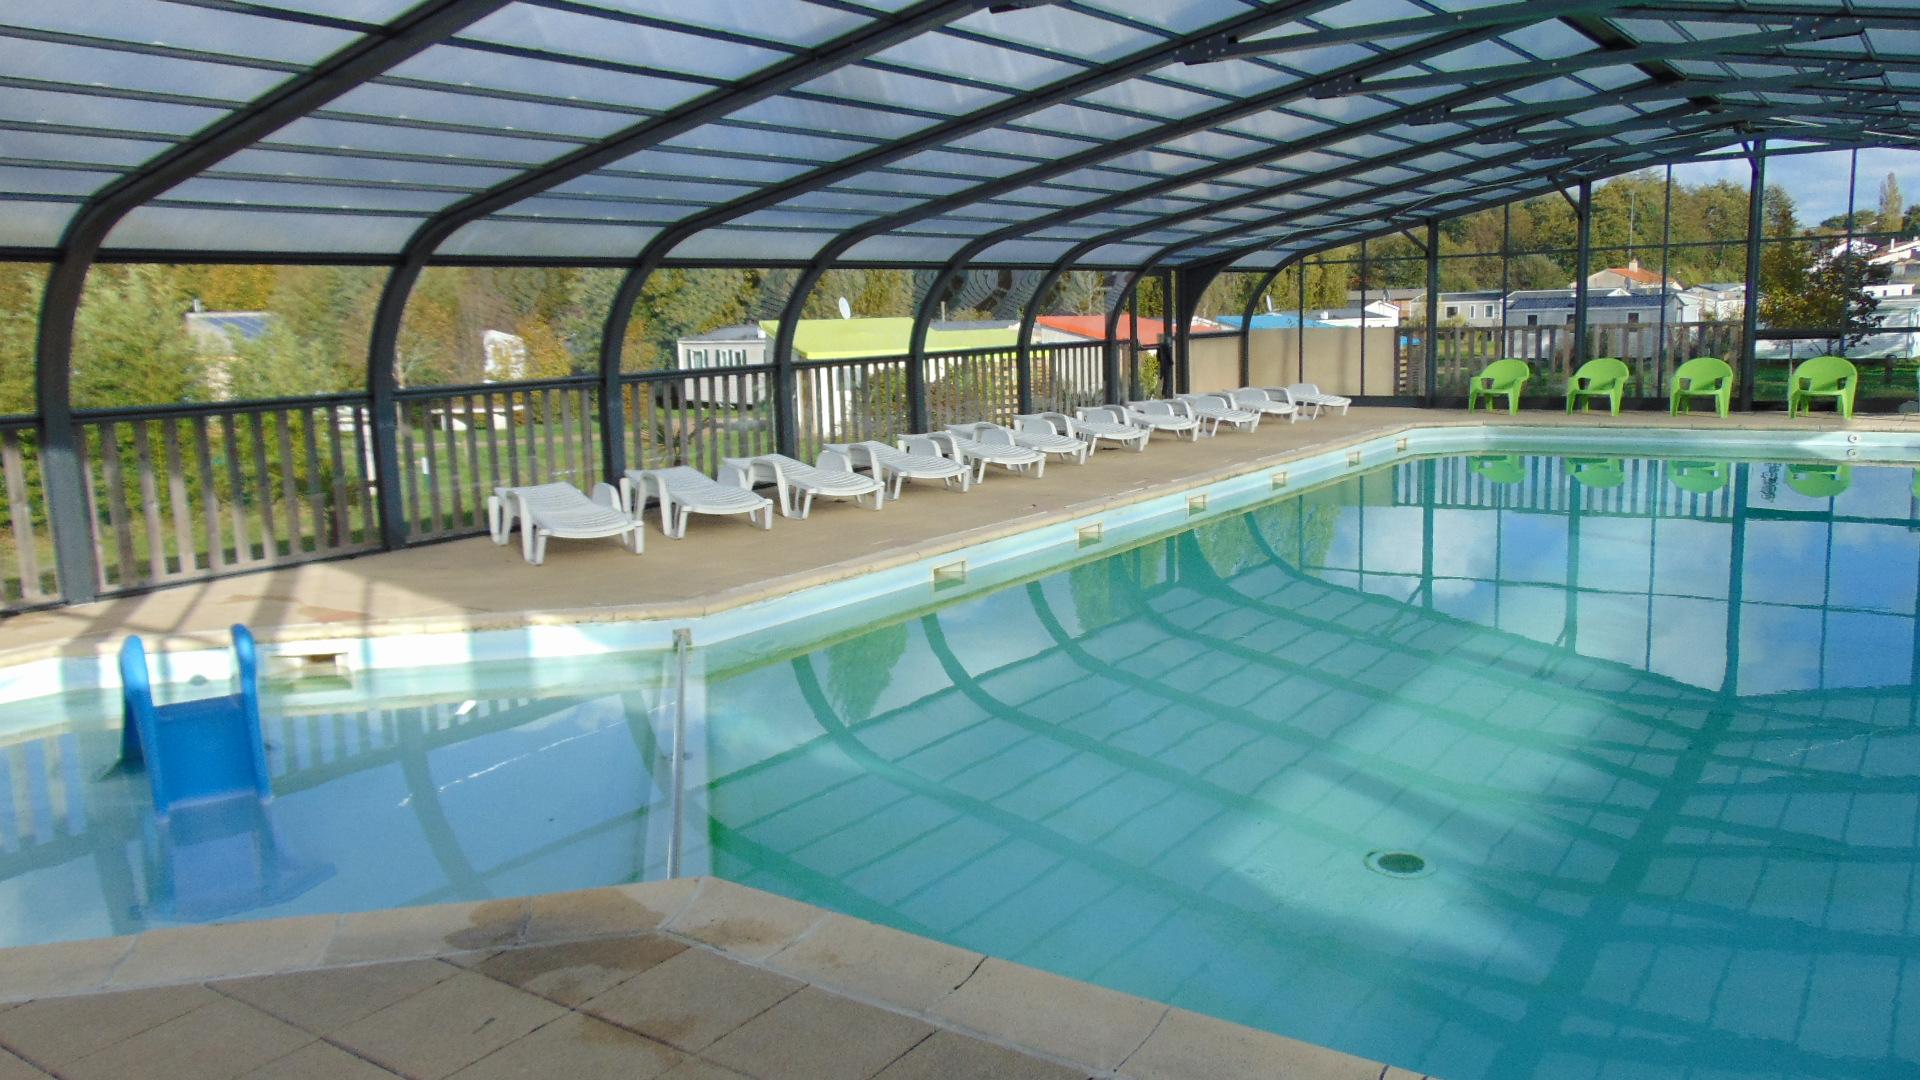 Camping vend e avec piscine couverte for Camping brest piscine couverte